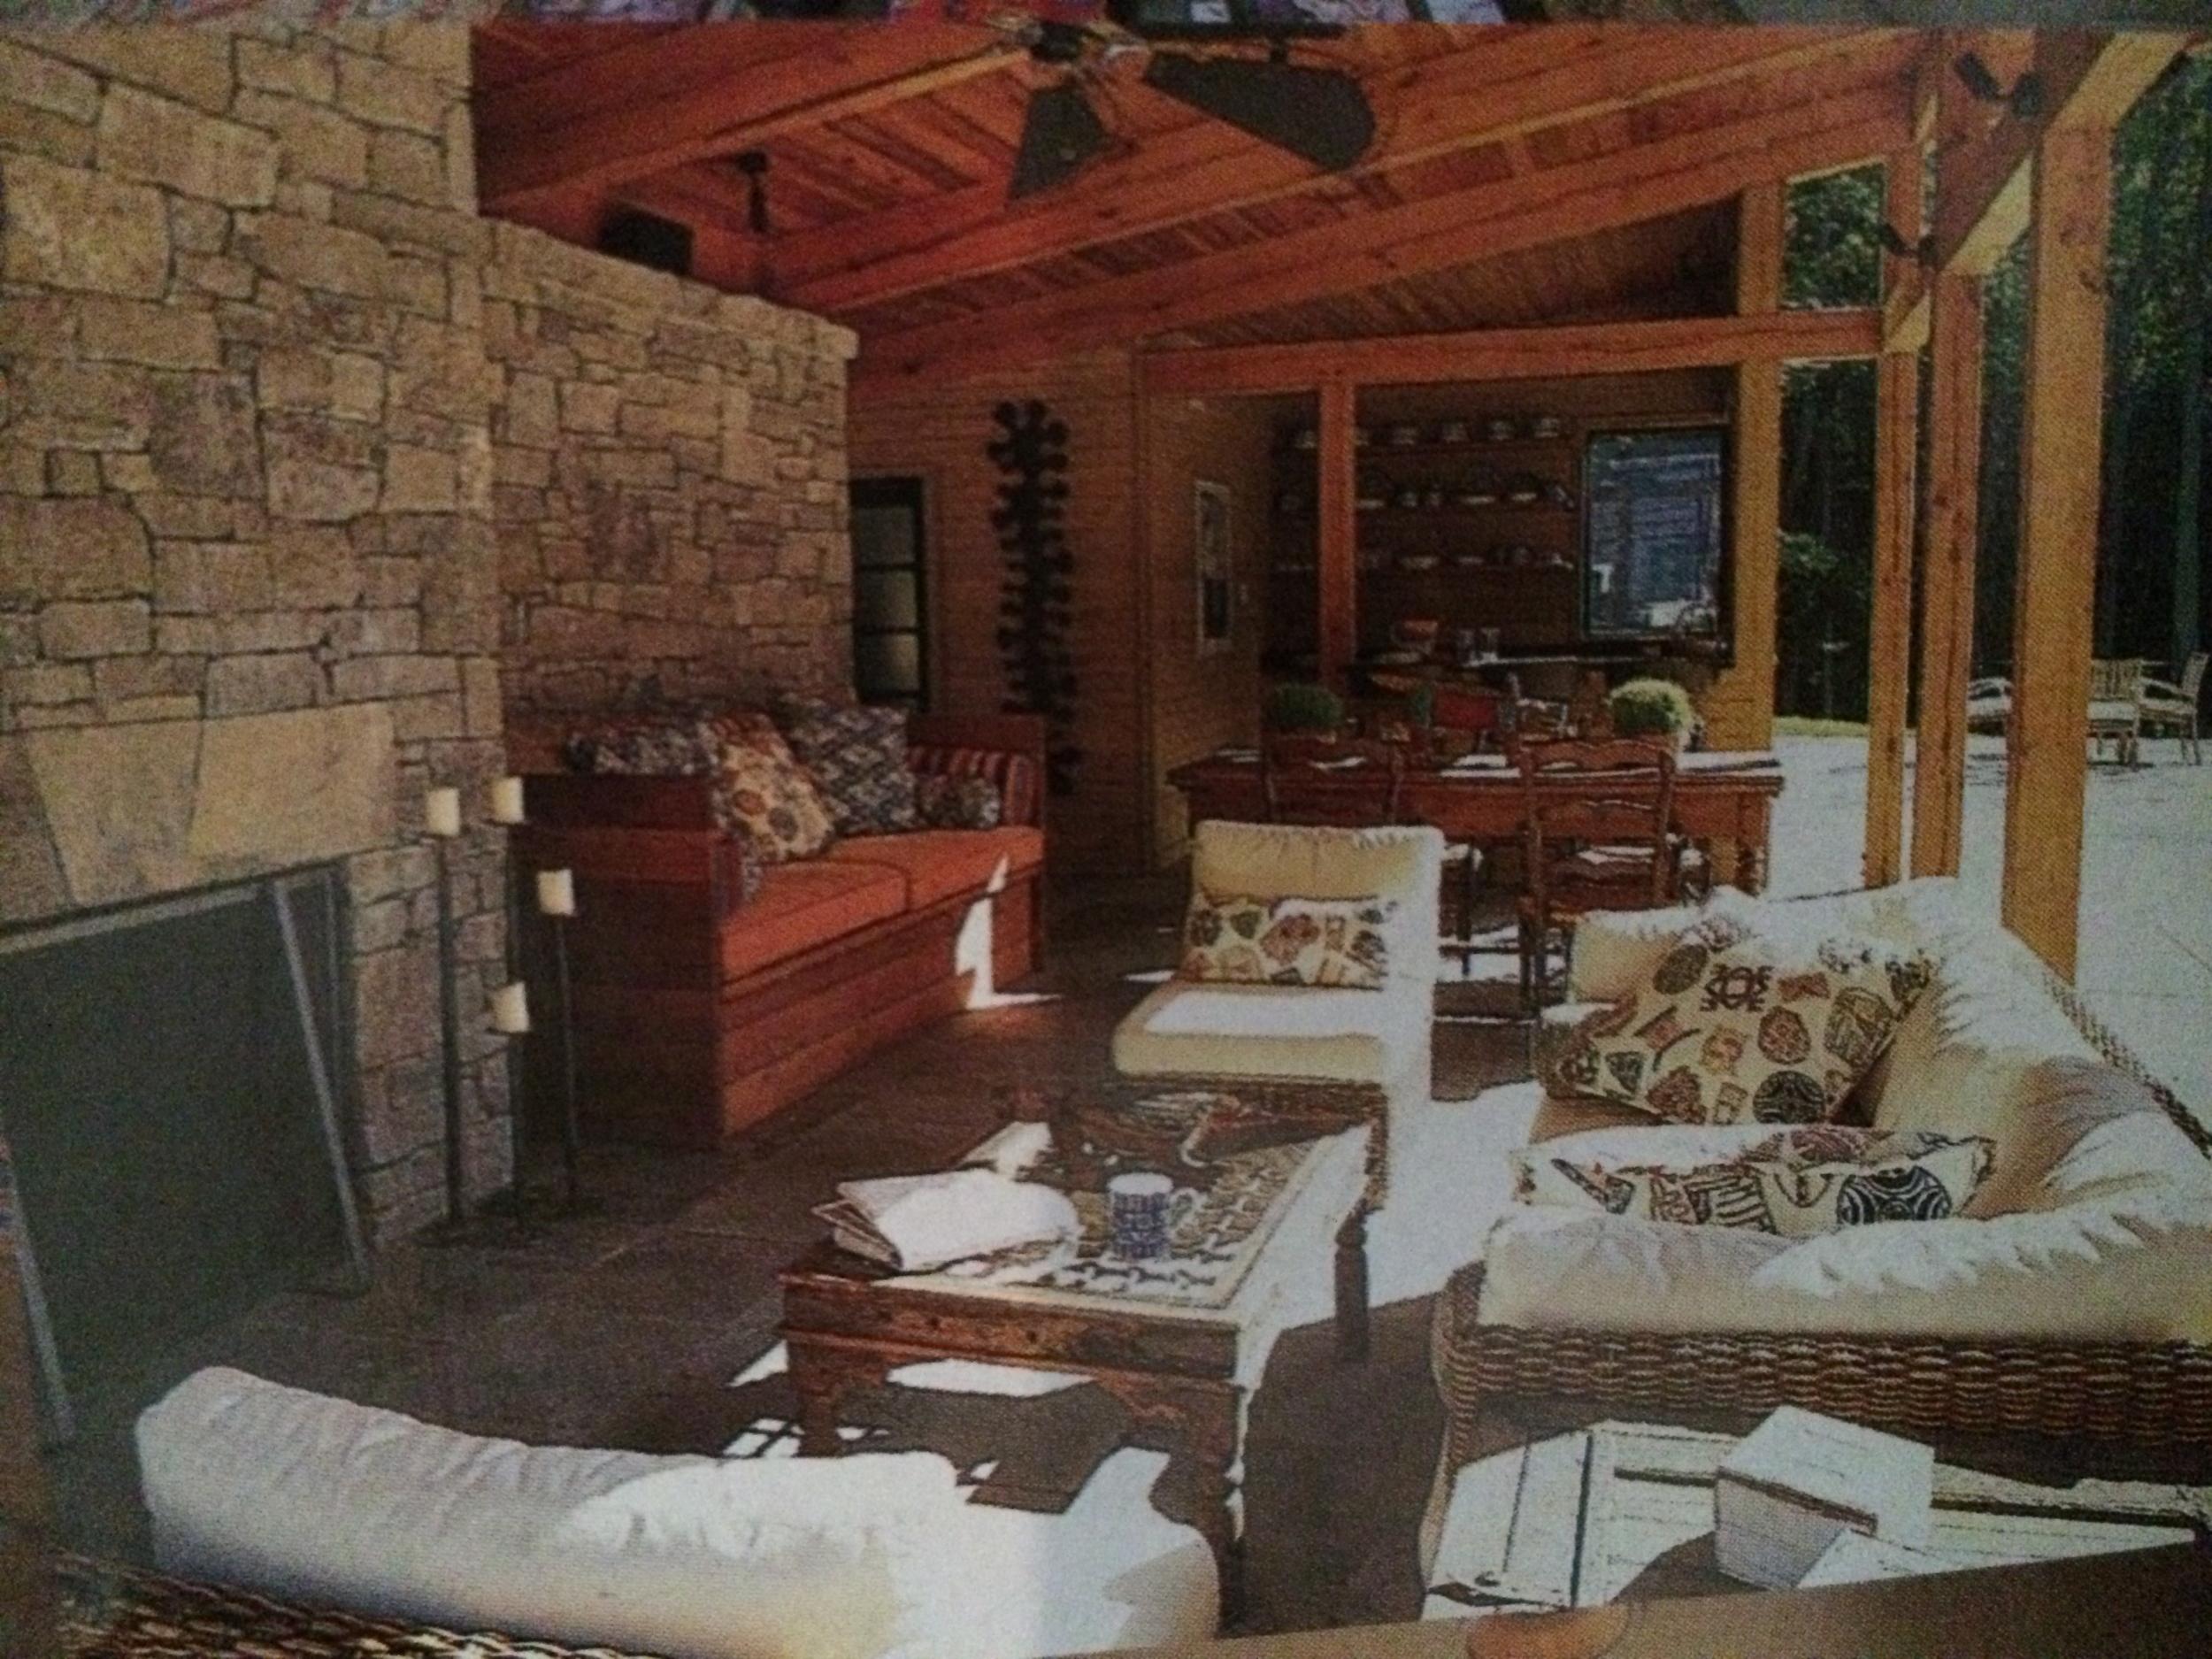 Outdoor living room, West Virginia residence